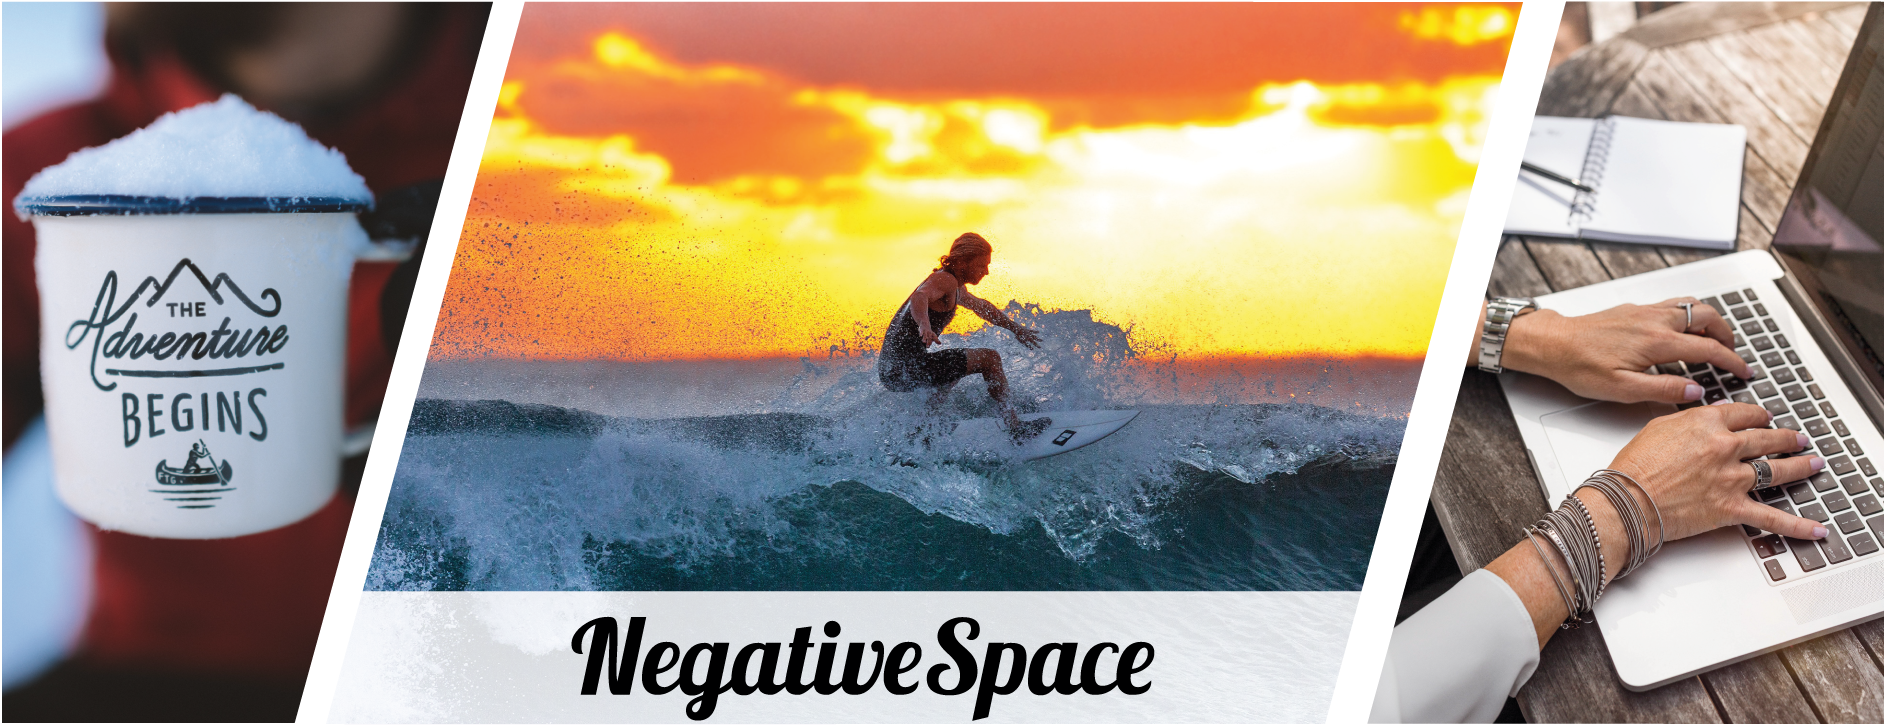 NegativeSpace image gallery